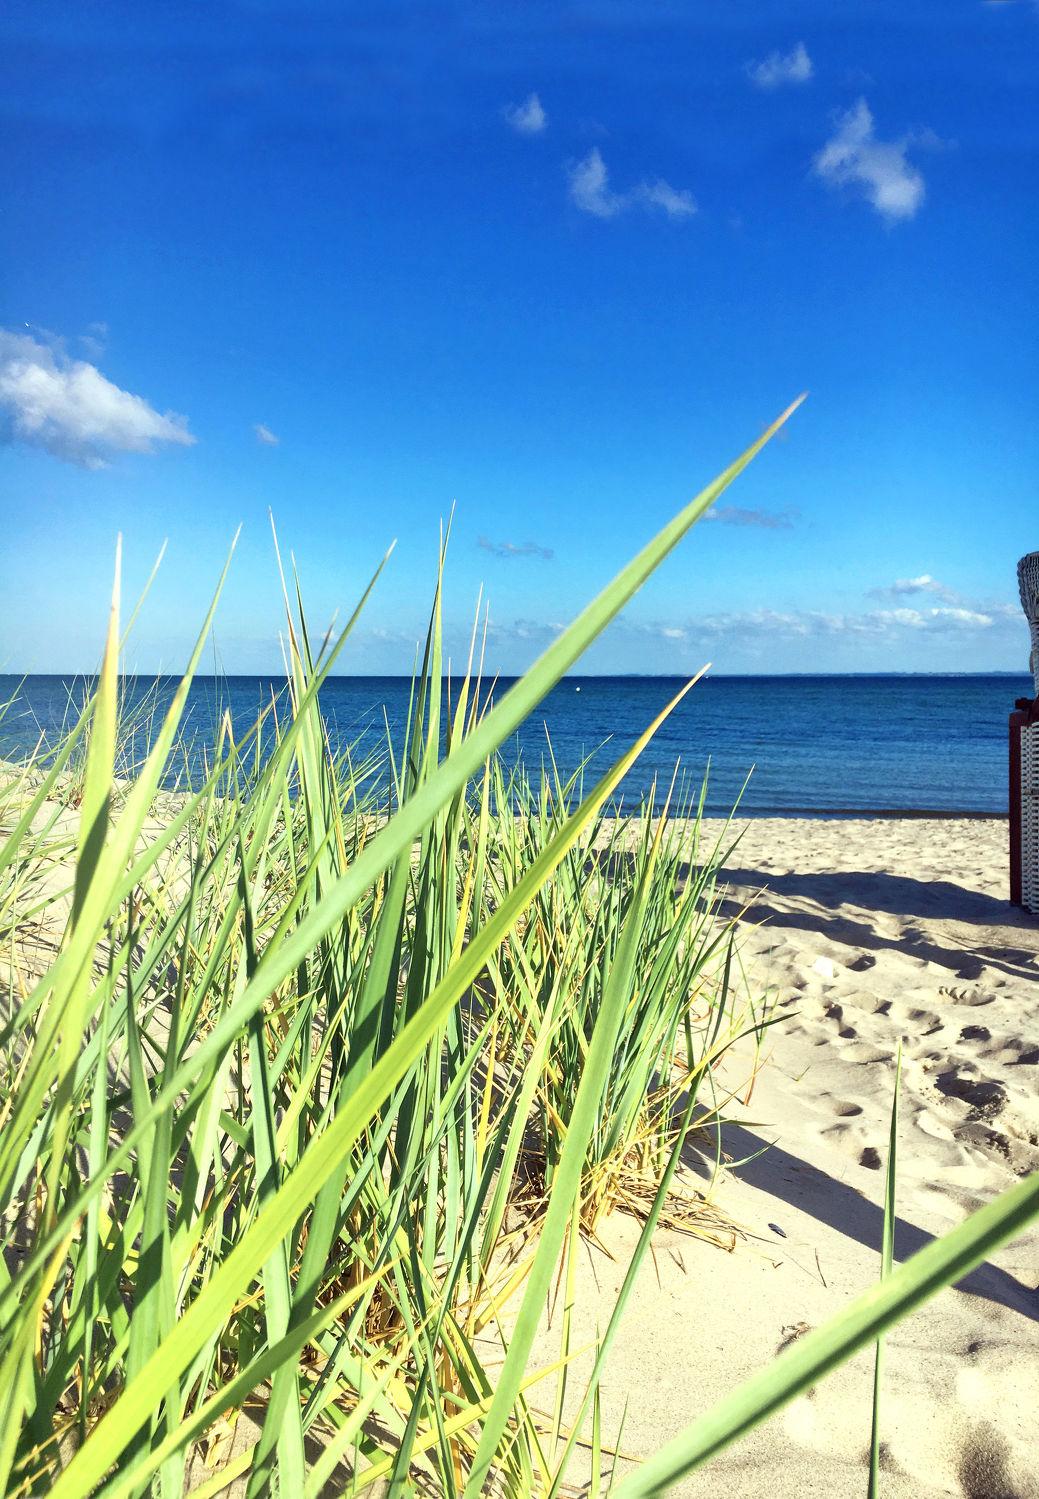 Bild mit Himmel, Horizont, Sand, Urlaub, Strand, Sandstrand, Meerblick, Panorama, Ostsee, Meer, Düne, Dünengras, Holliday, Nordsee, Blauer Himmel, Schilfgras, Dünen Schilf, Strandpflanzen, Strandpflanze, Dünen panorama, Dünenblick, Wasserblick